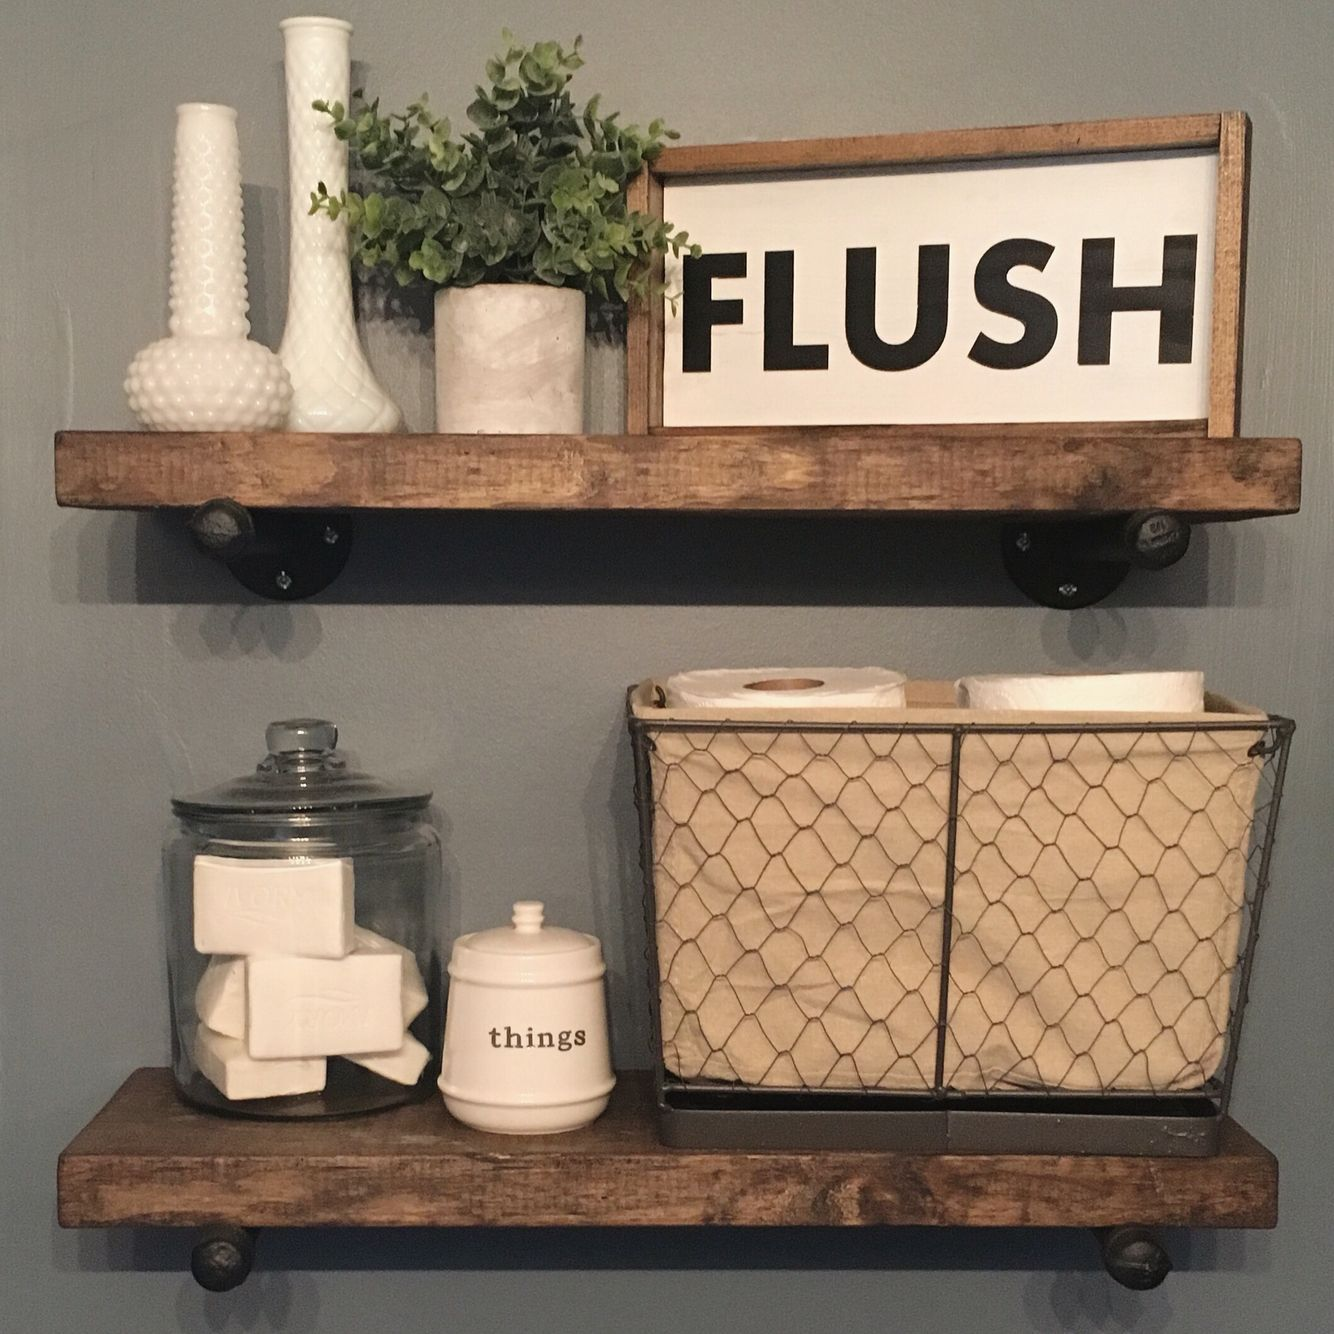 Bathroom decor flush sign industrial shelves farmhouse decor